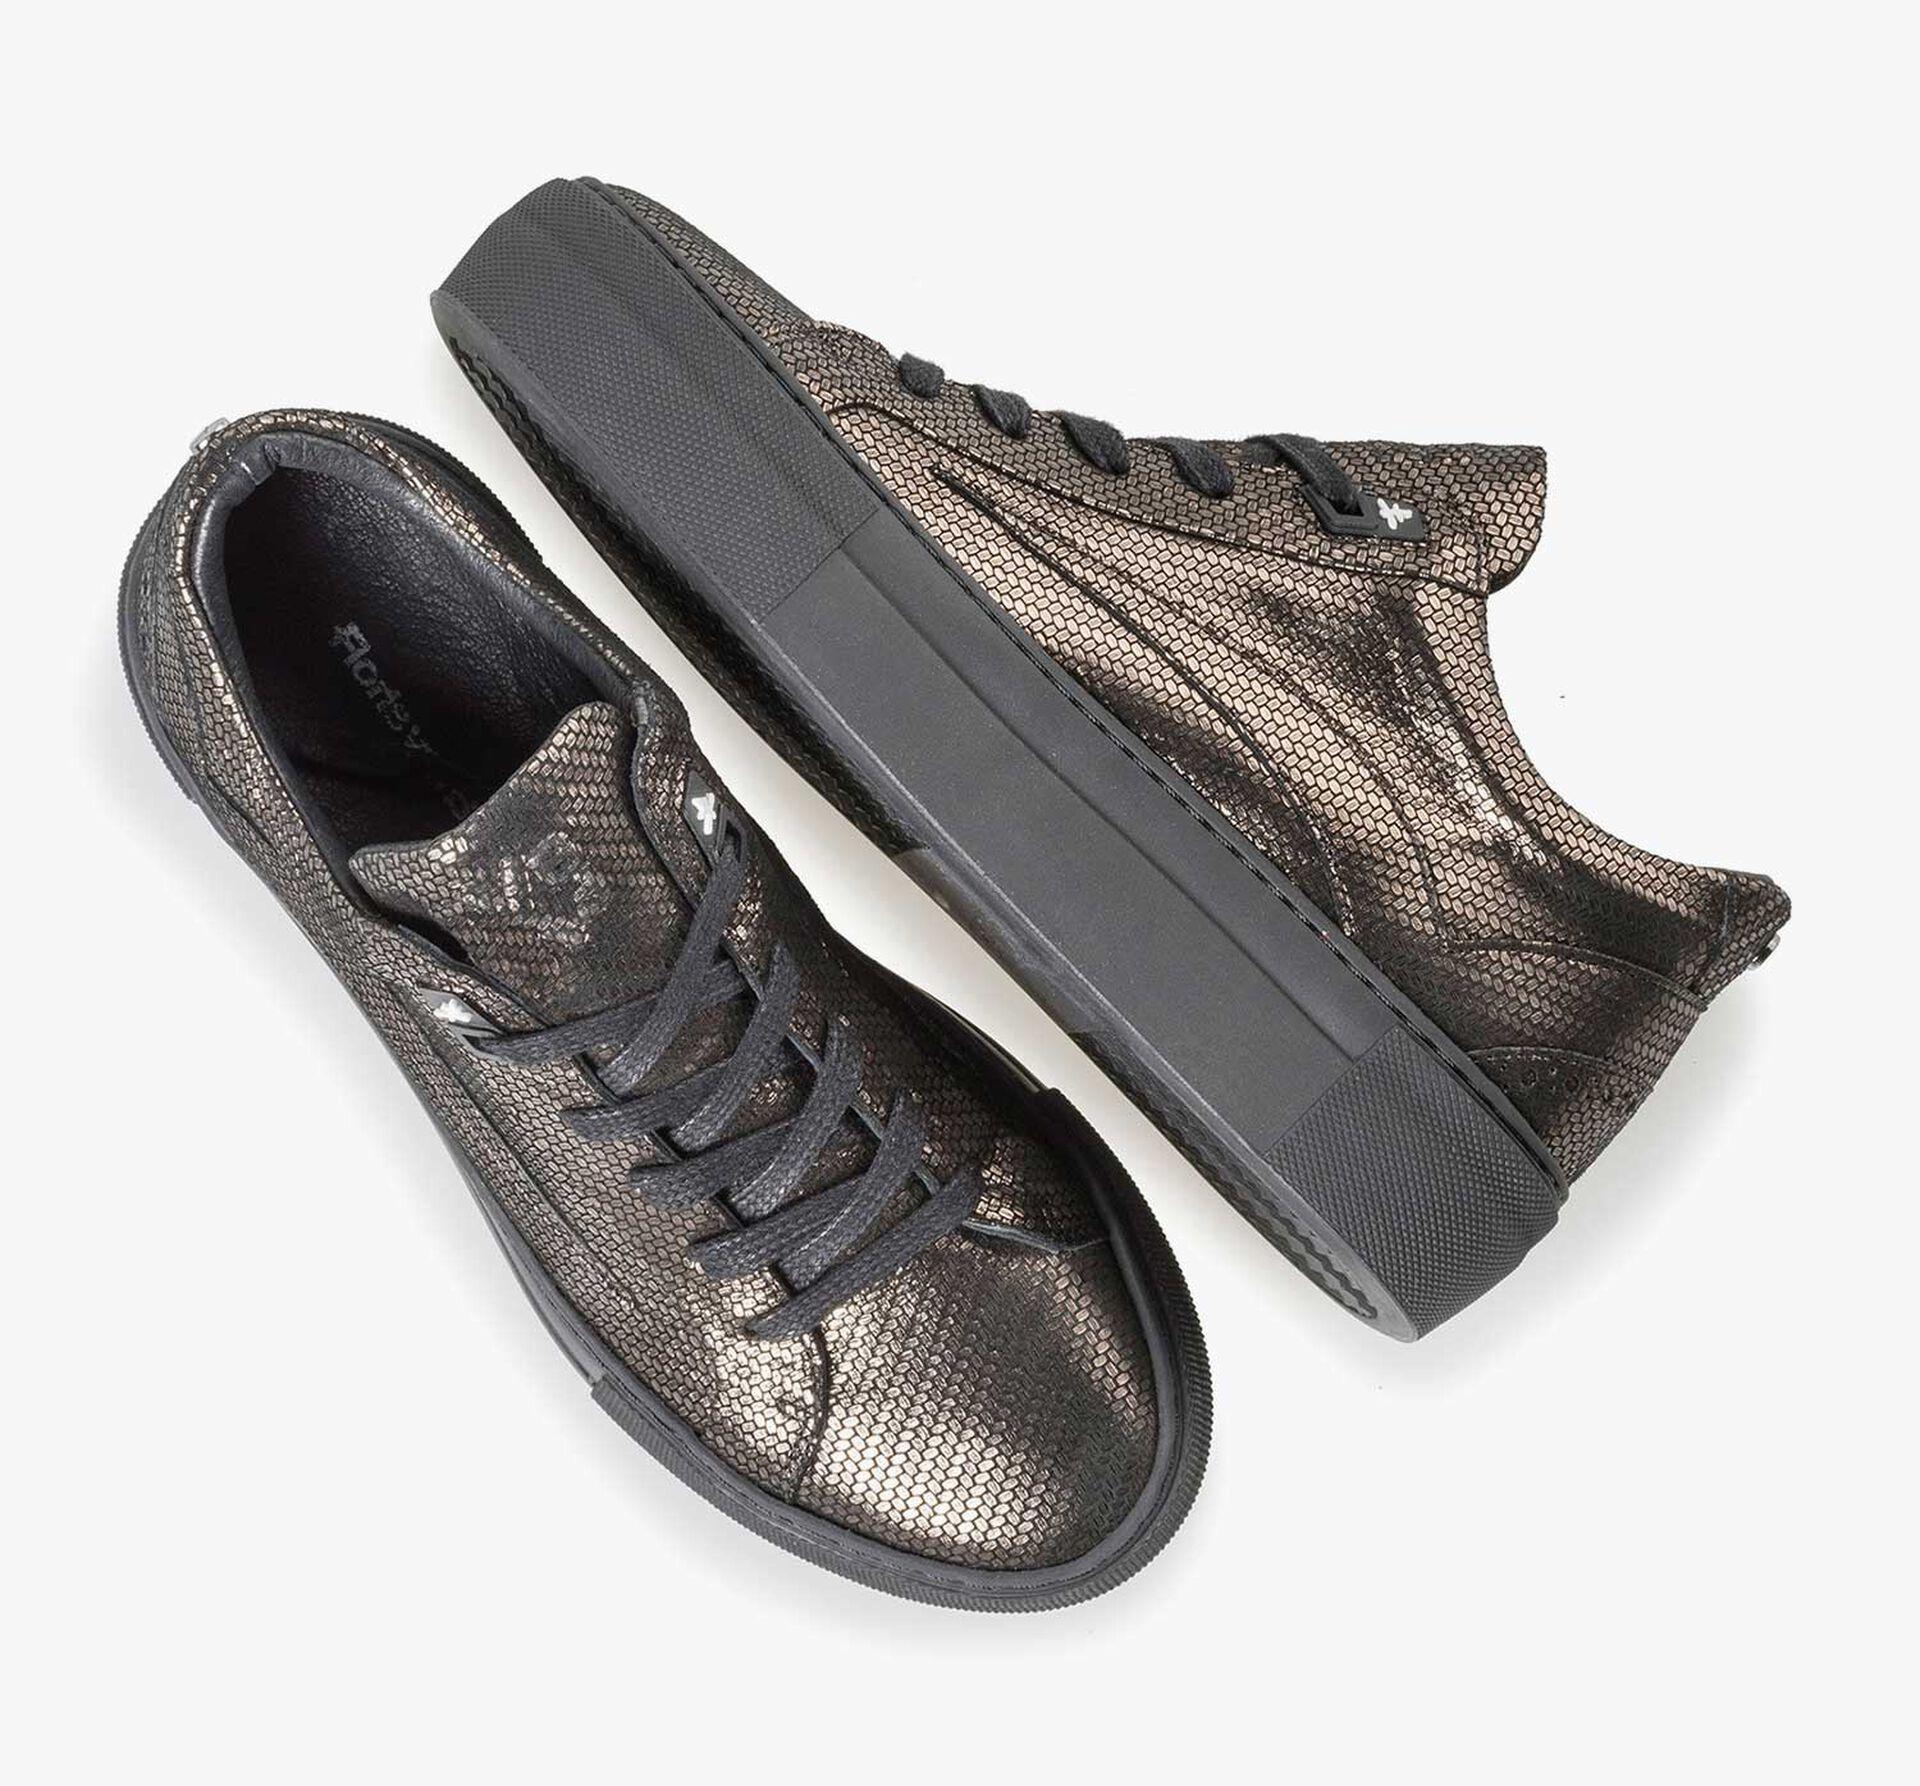 Sneaker mit bronzefarbenem Metallic-Print